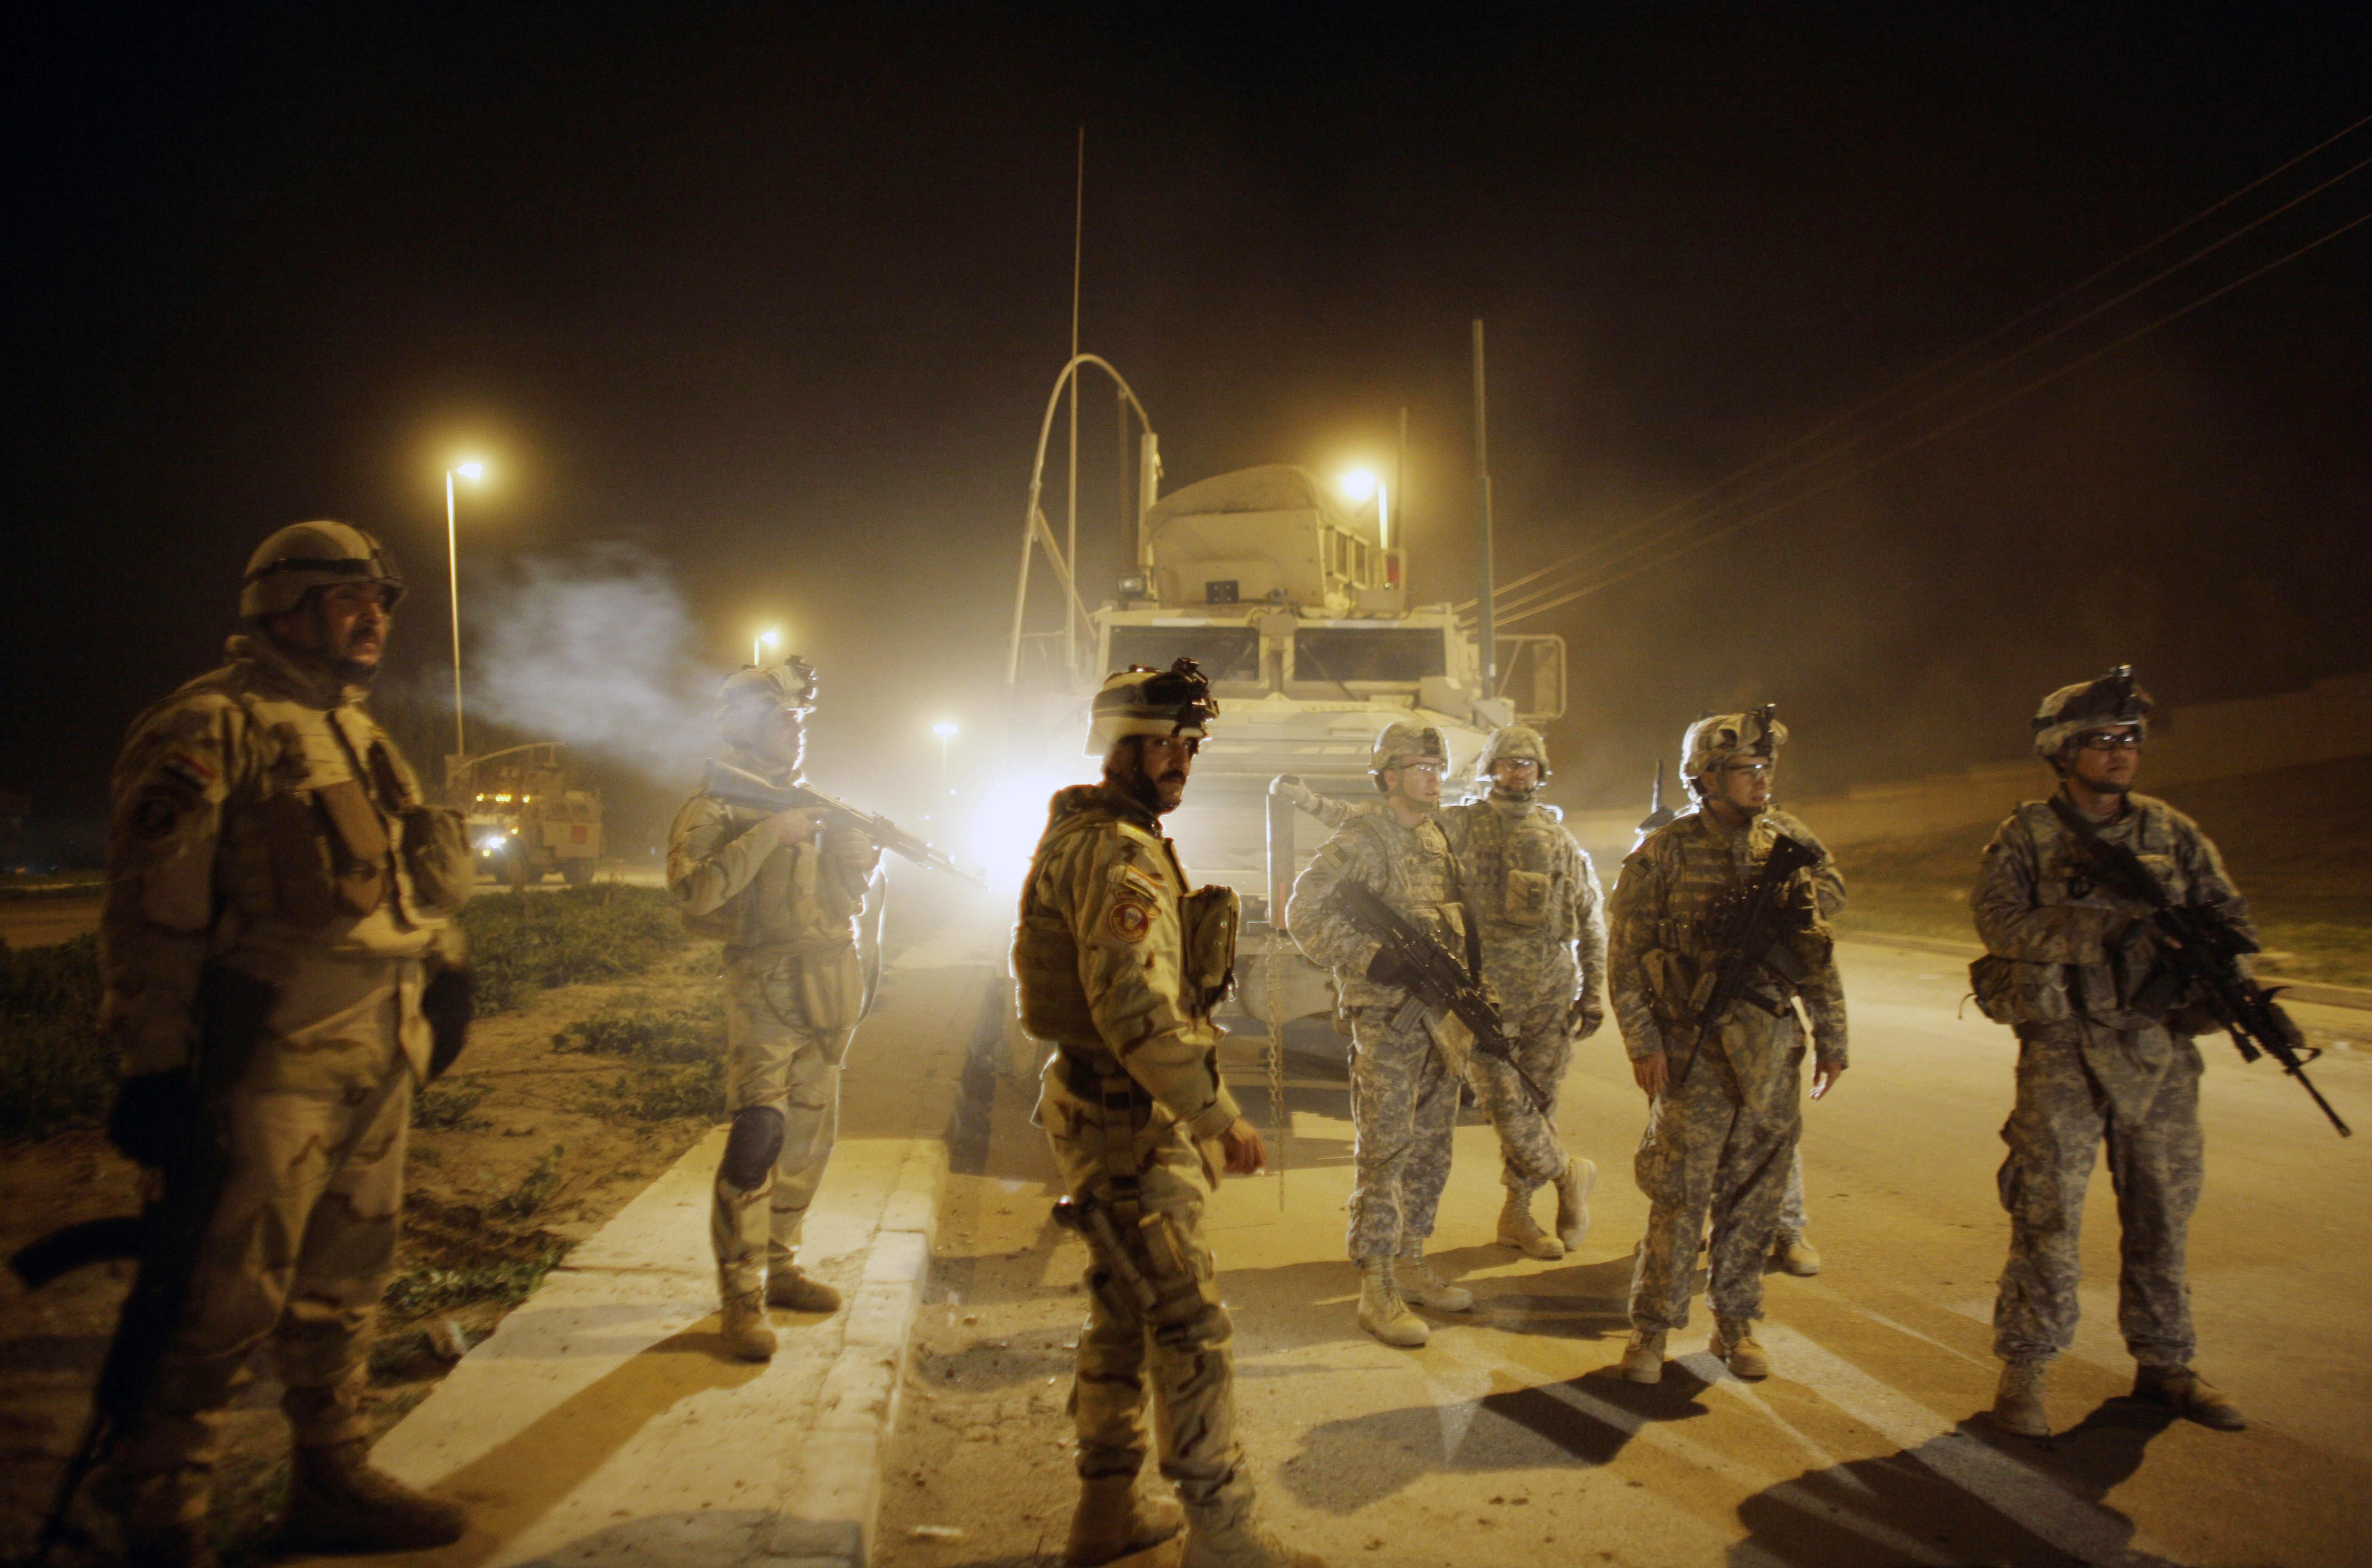 U.S. Army soldiers,Mosul, north of Baghdad, Iraq (File)